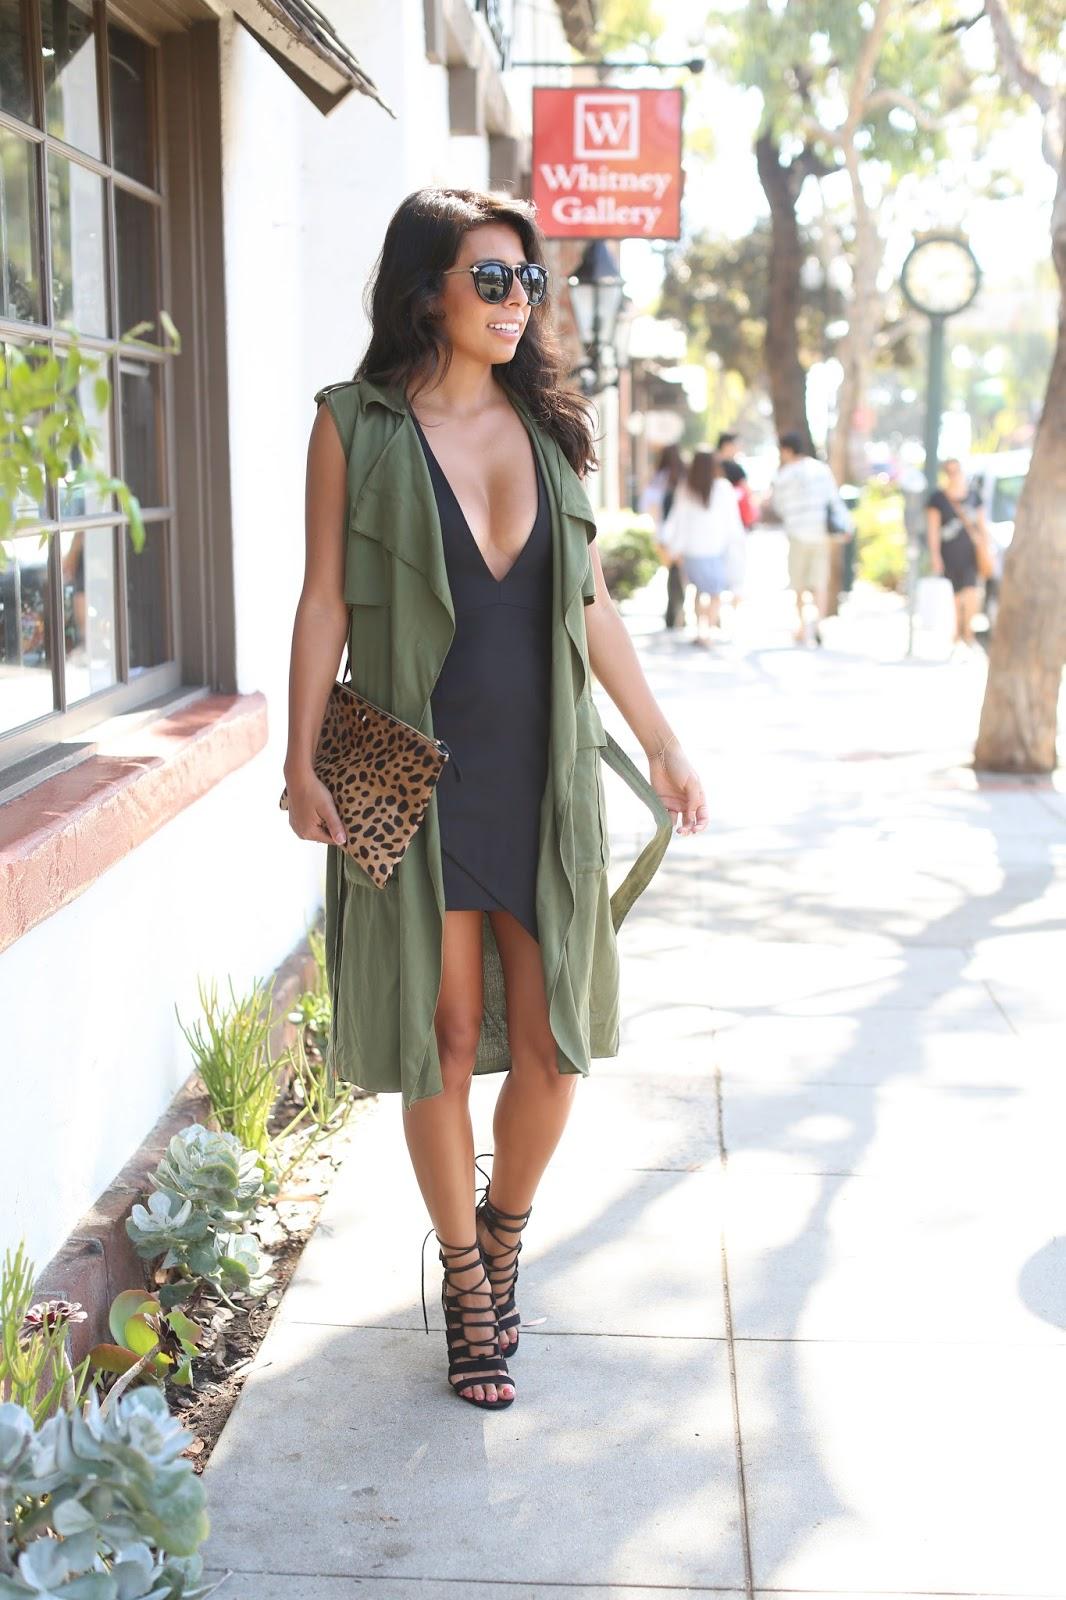 kardashian kollection shoes, claire vivier leopard clutch, how to wear little black dress